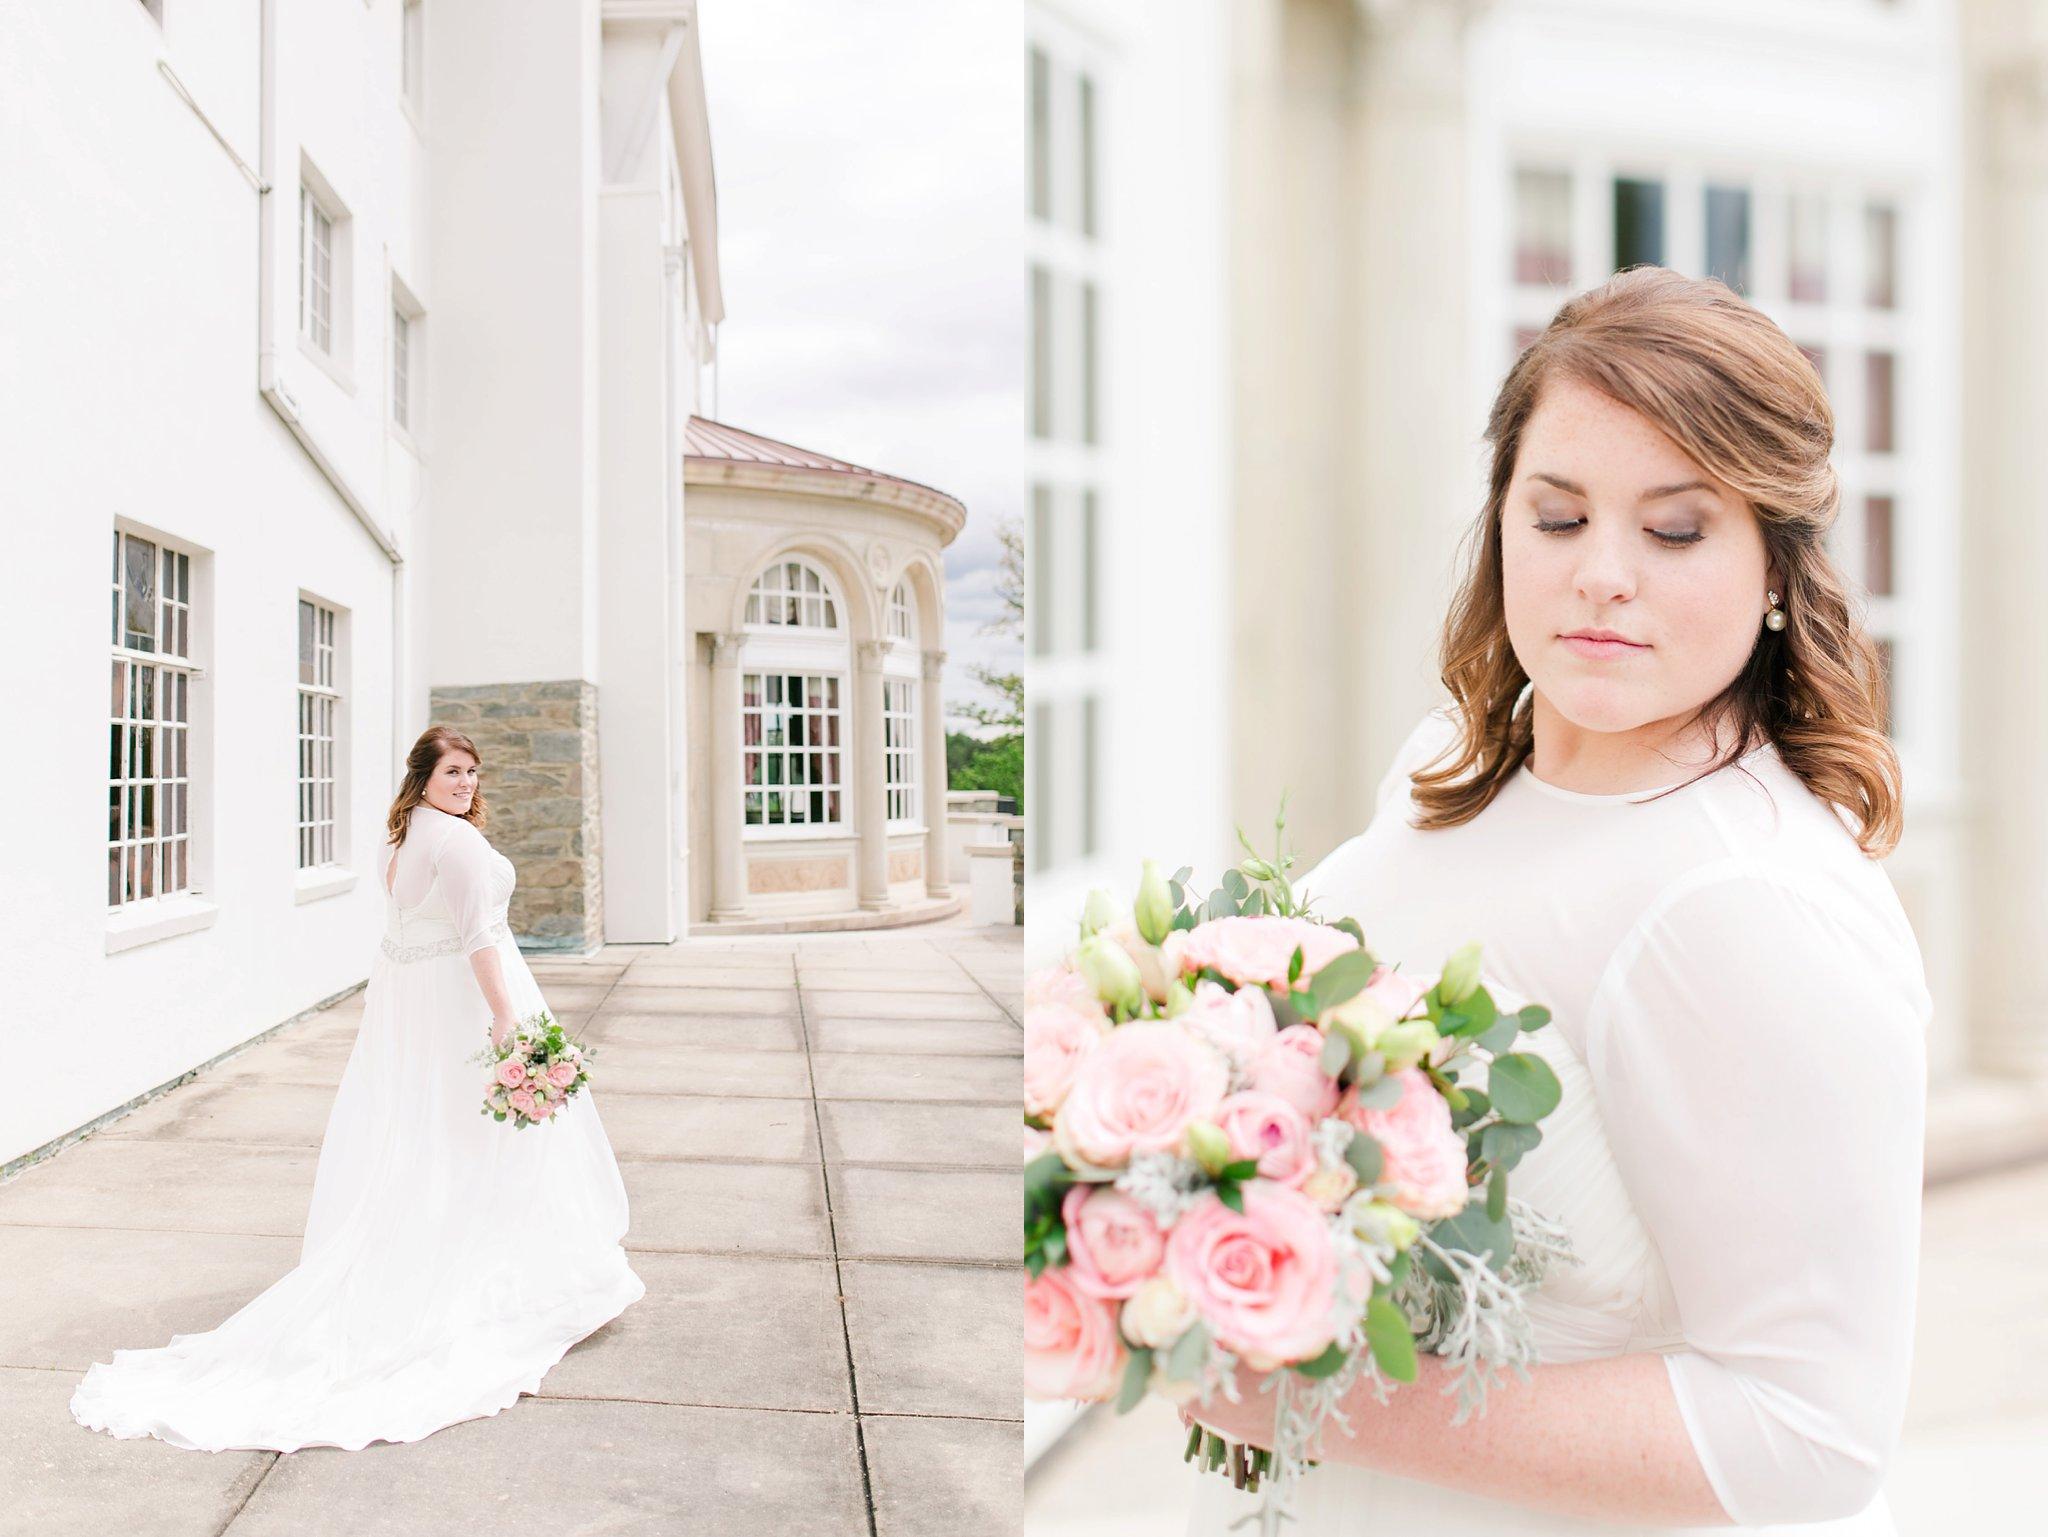 Congressional Country Club Wedding Photos DC Maryland Wedding Photographer Megan Kelsey Photography Kelly & Andrew-105.jpg